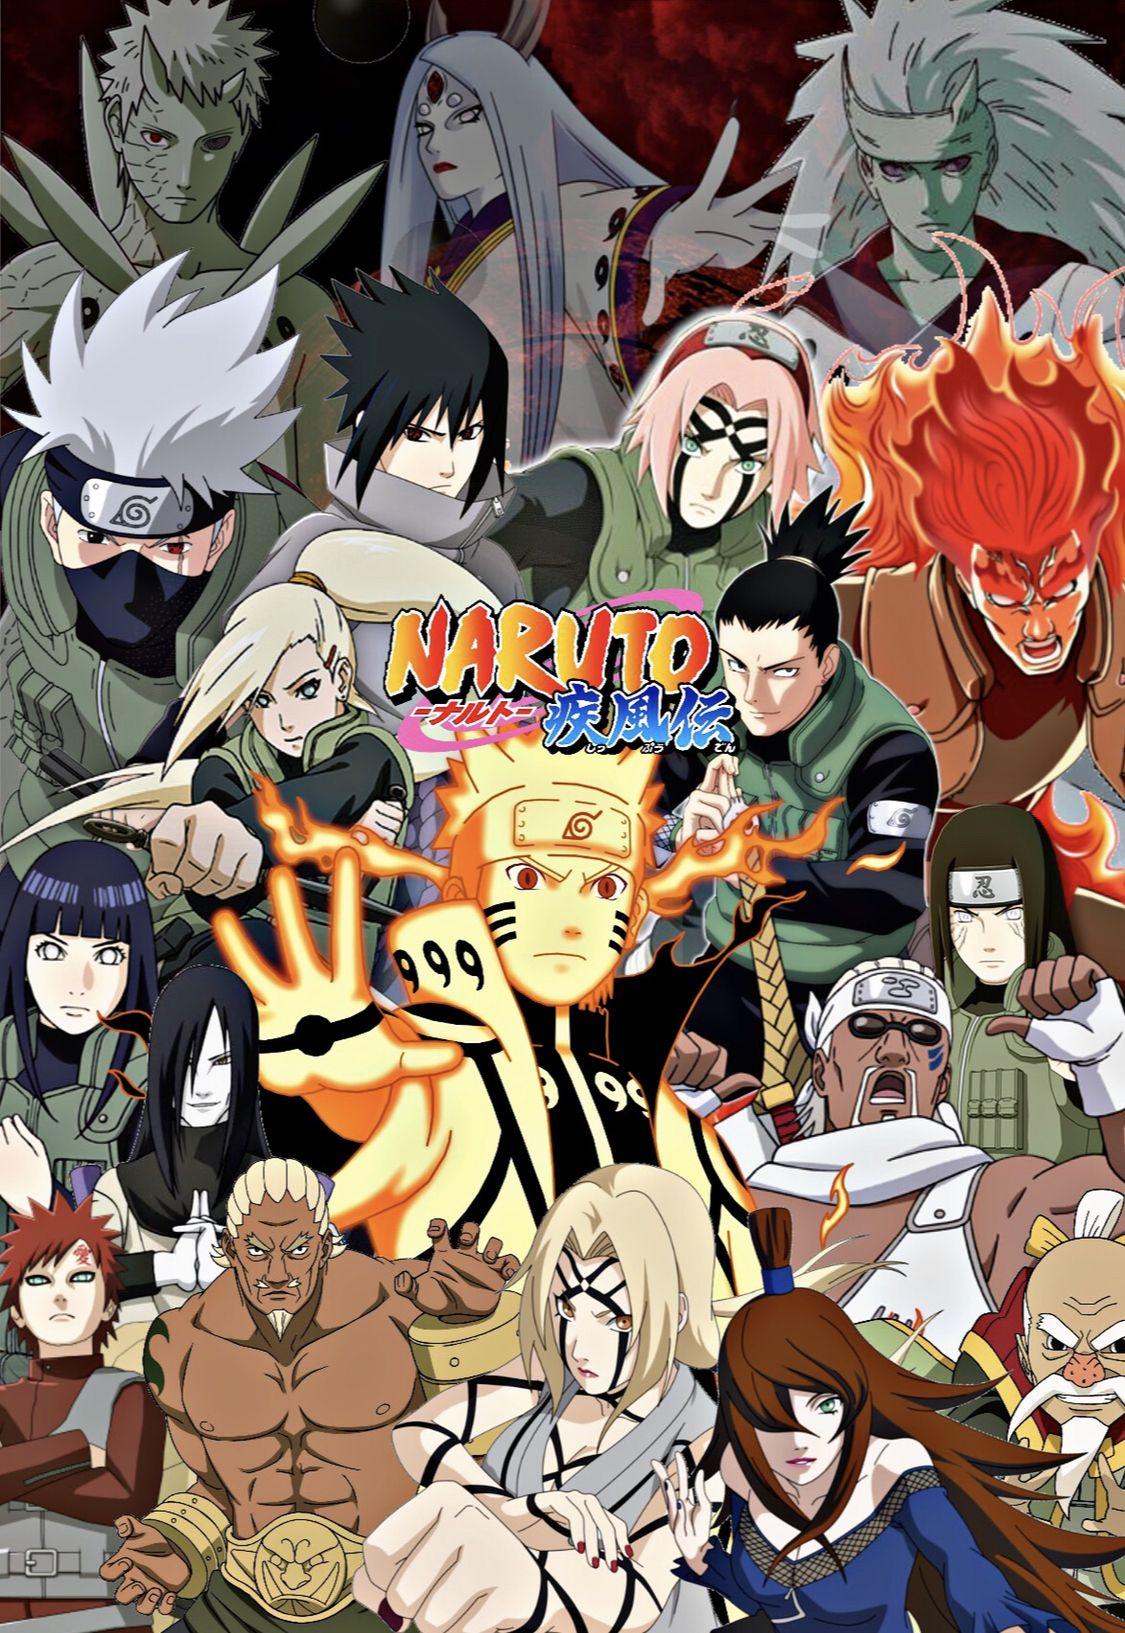 Naruto Fourth Shinobi World War Poster Featuring All The Vital